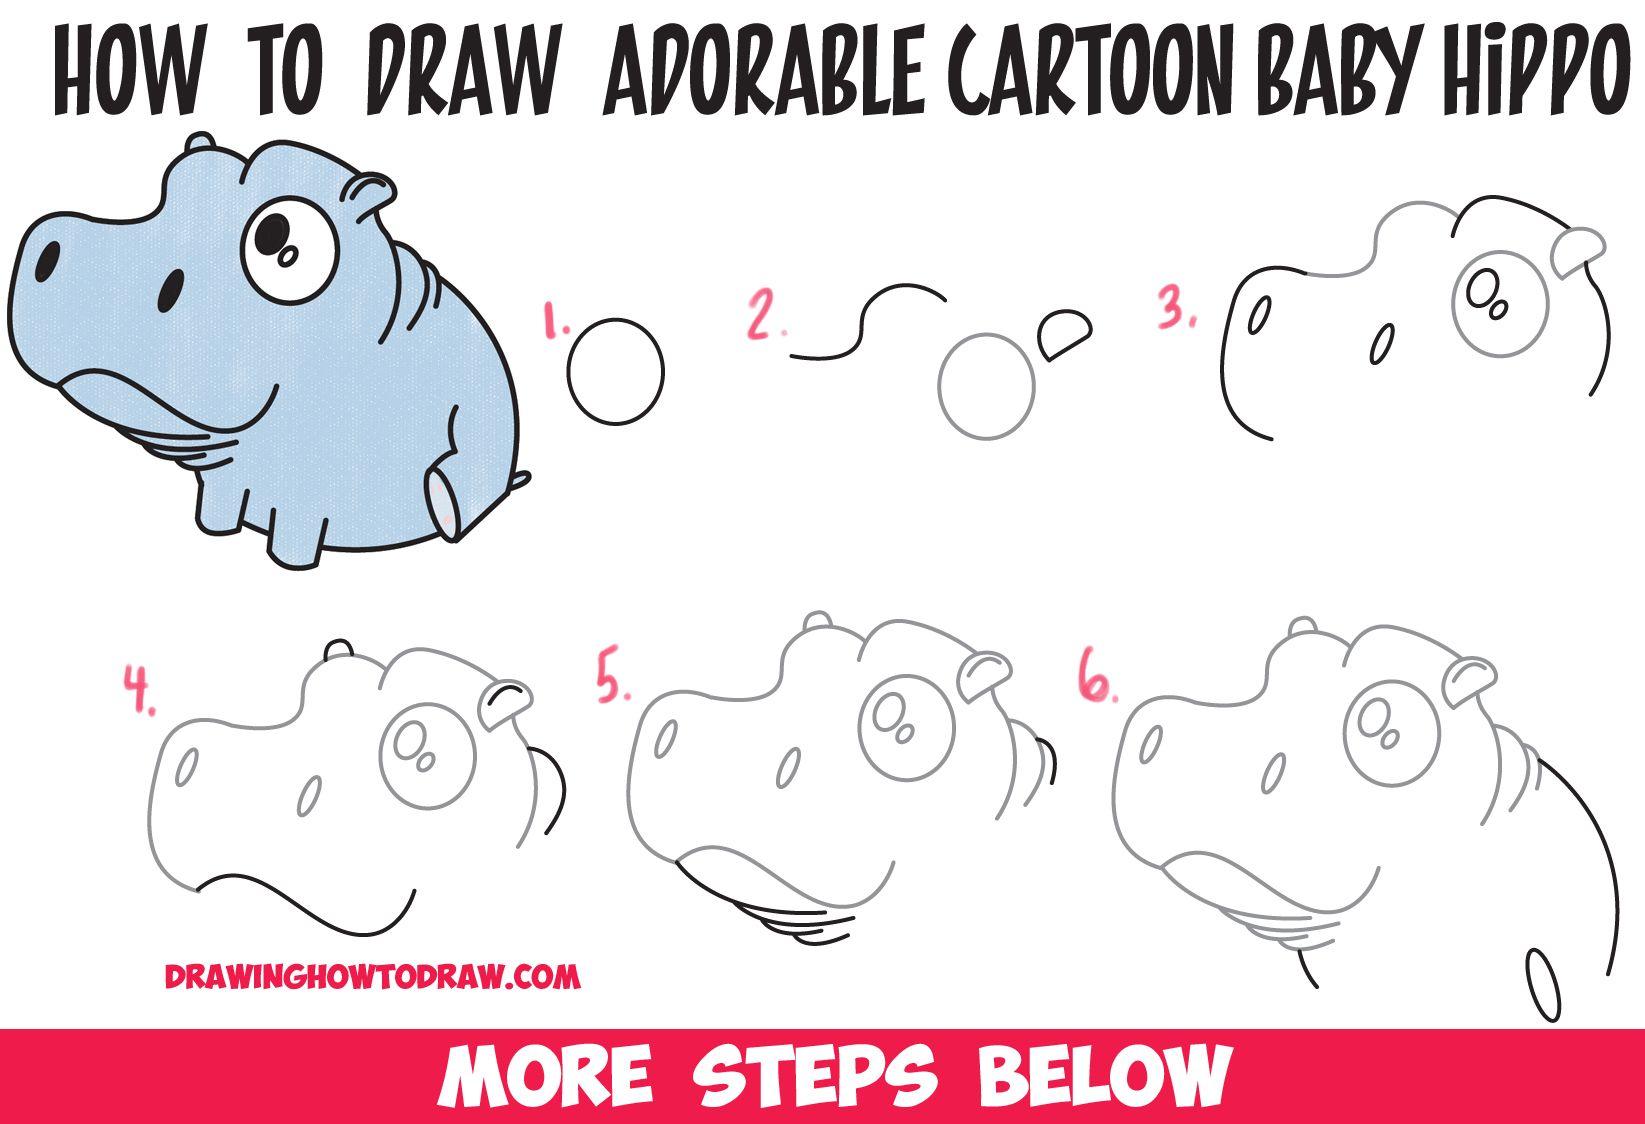 How To Draw A Cute Baby Hippo Cartoon Kawaii Chibi Easy Step